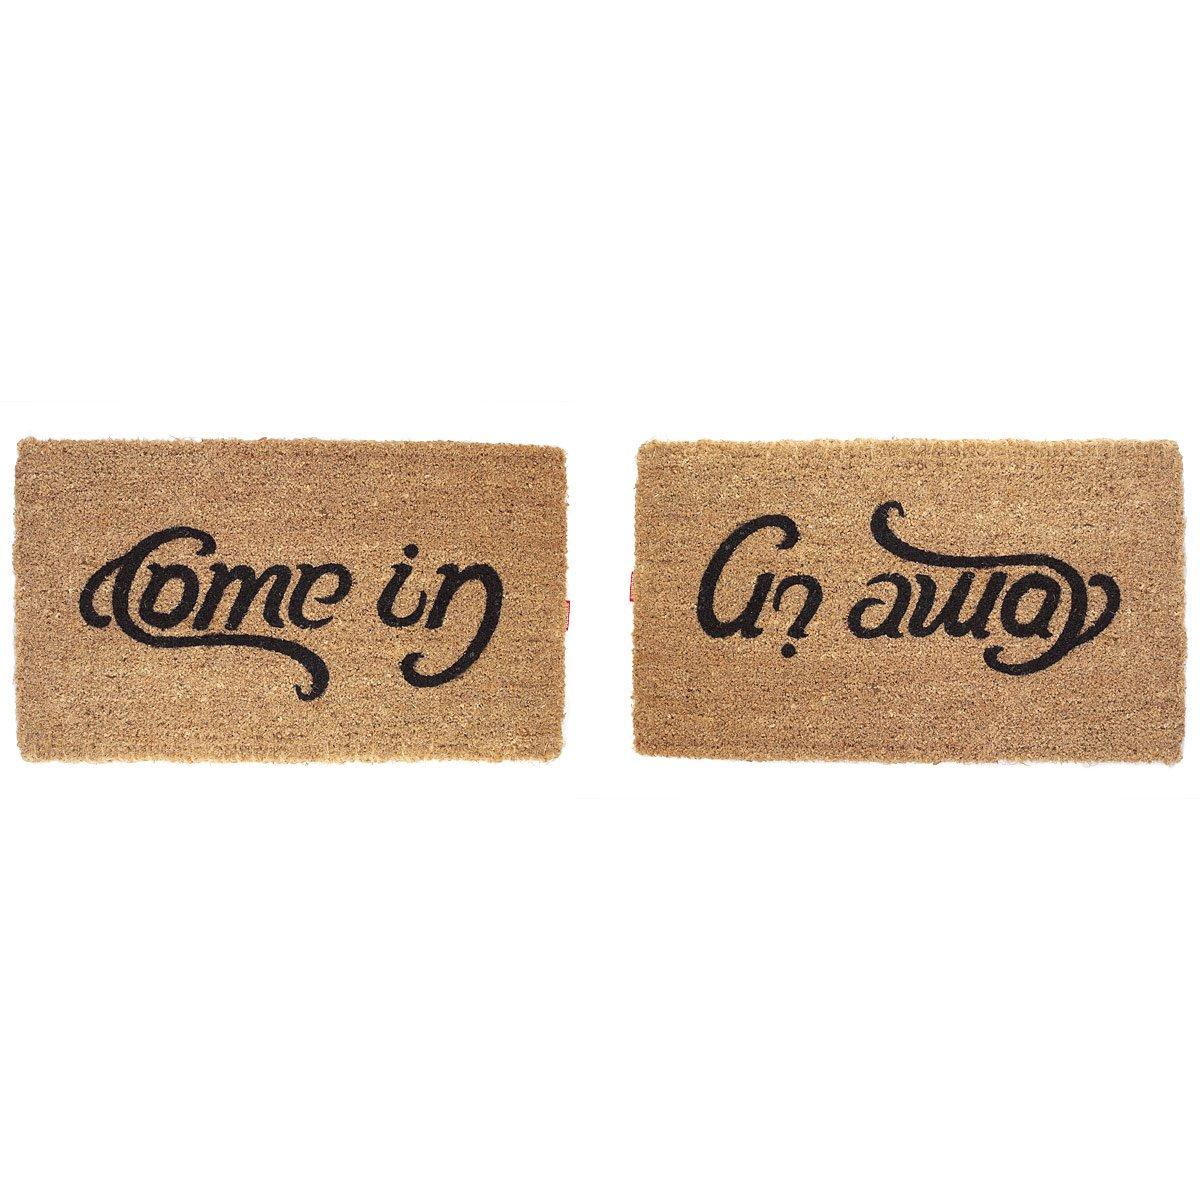 Come In, Go Away Doormat | Doormat, Come In, Go Away, Humor ...